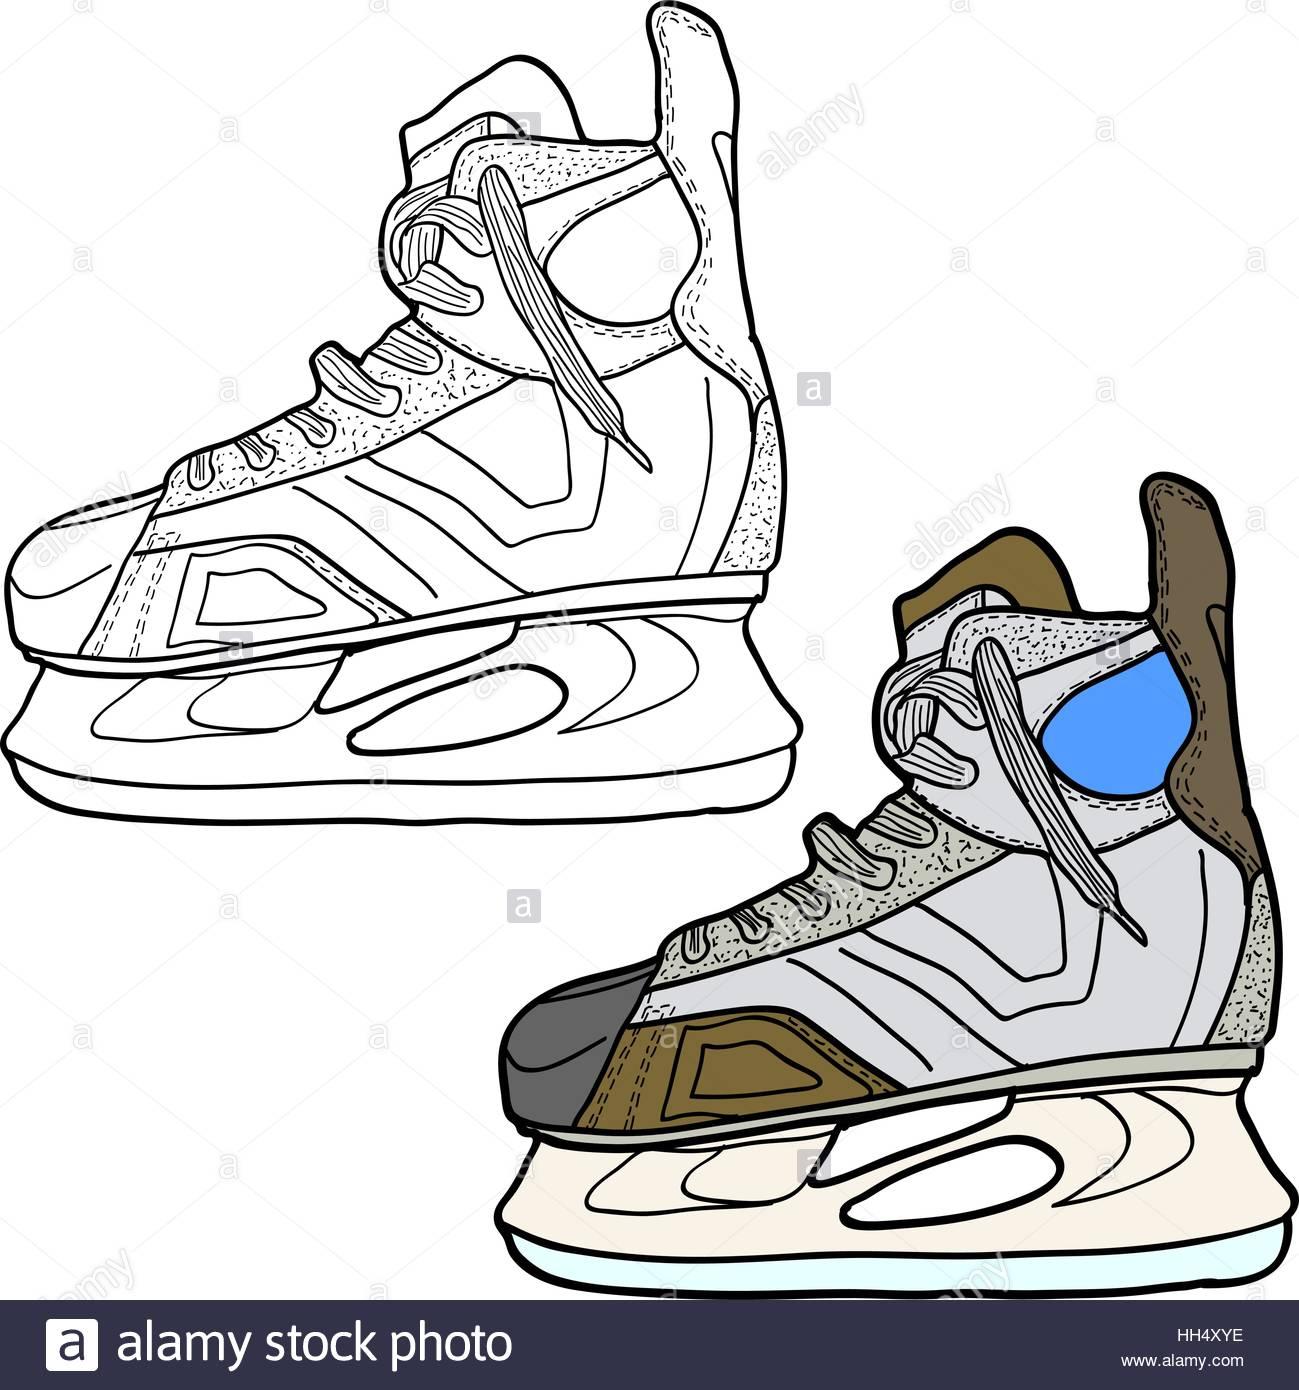 1299x1390 Sketch Of Hockey Skates. Skates To Play Hockey On Ice, Vector